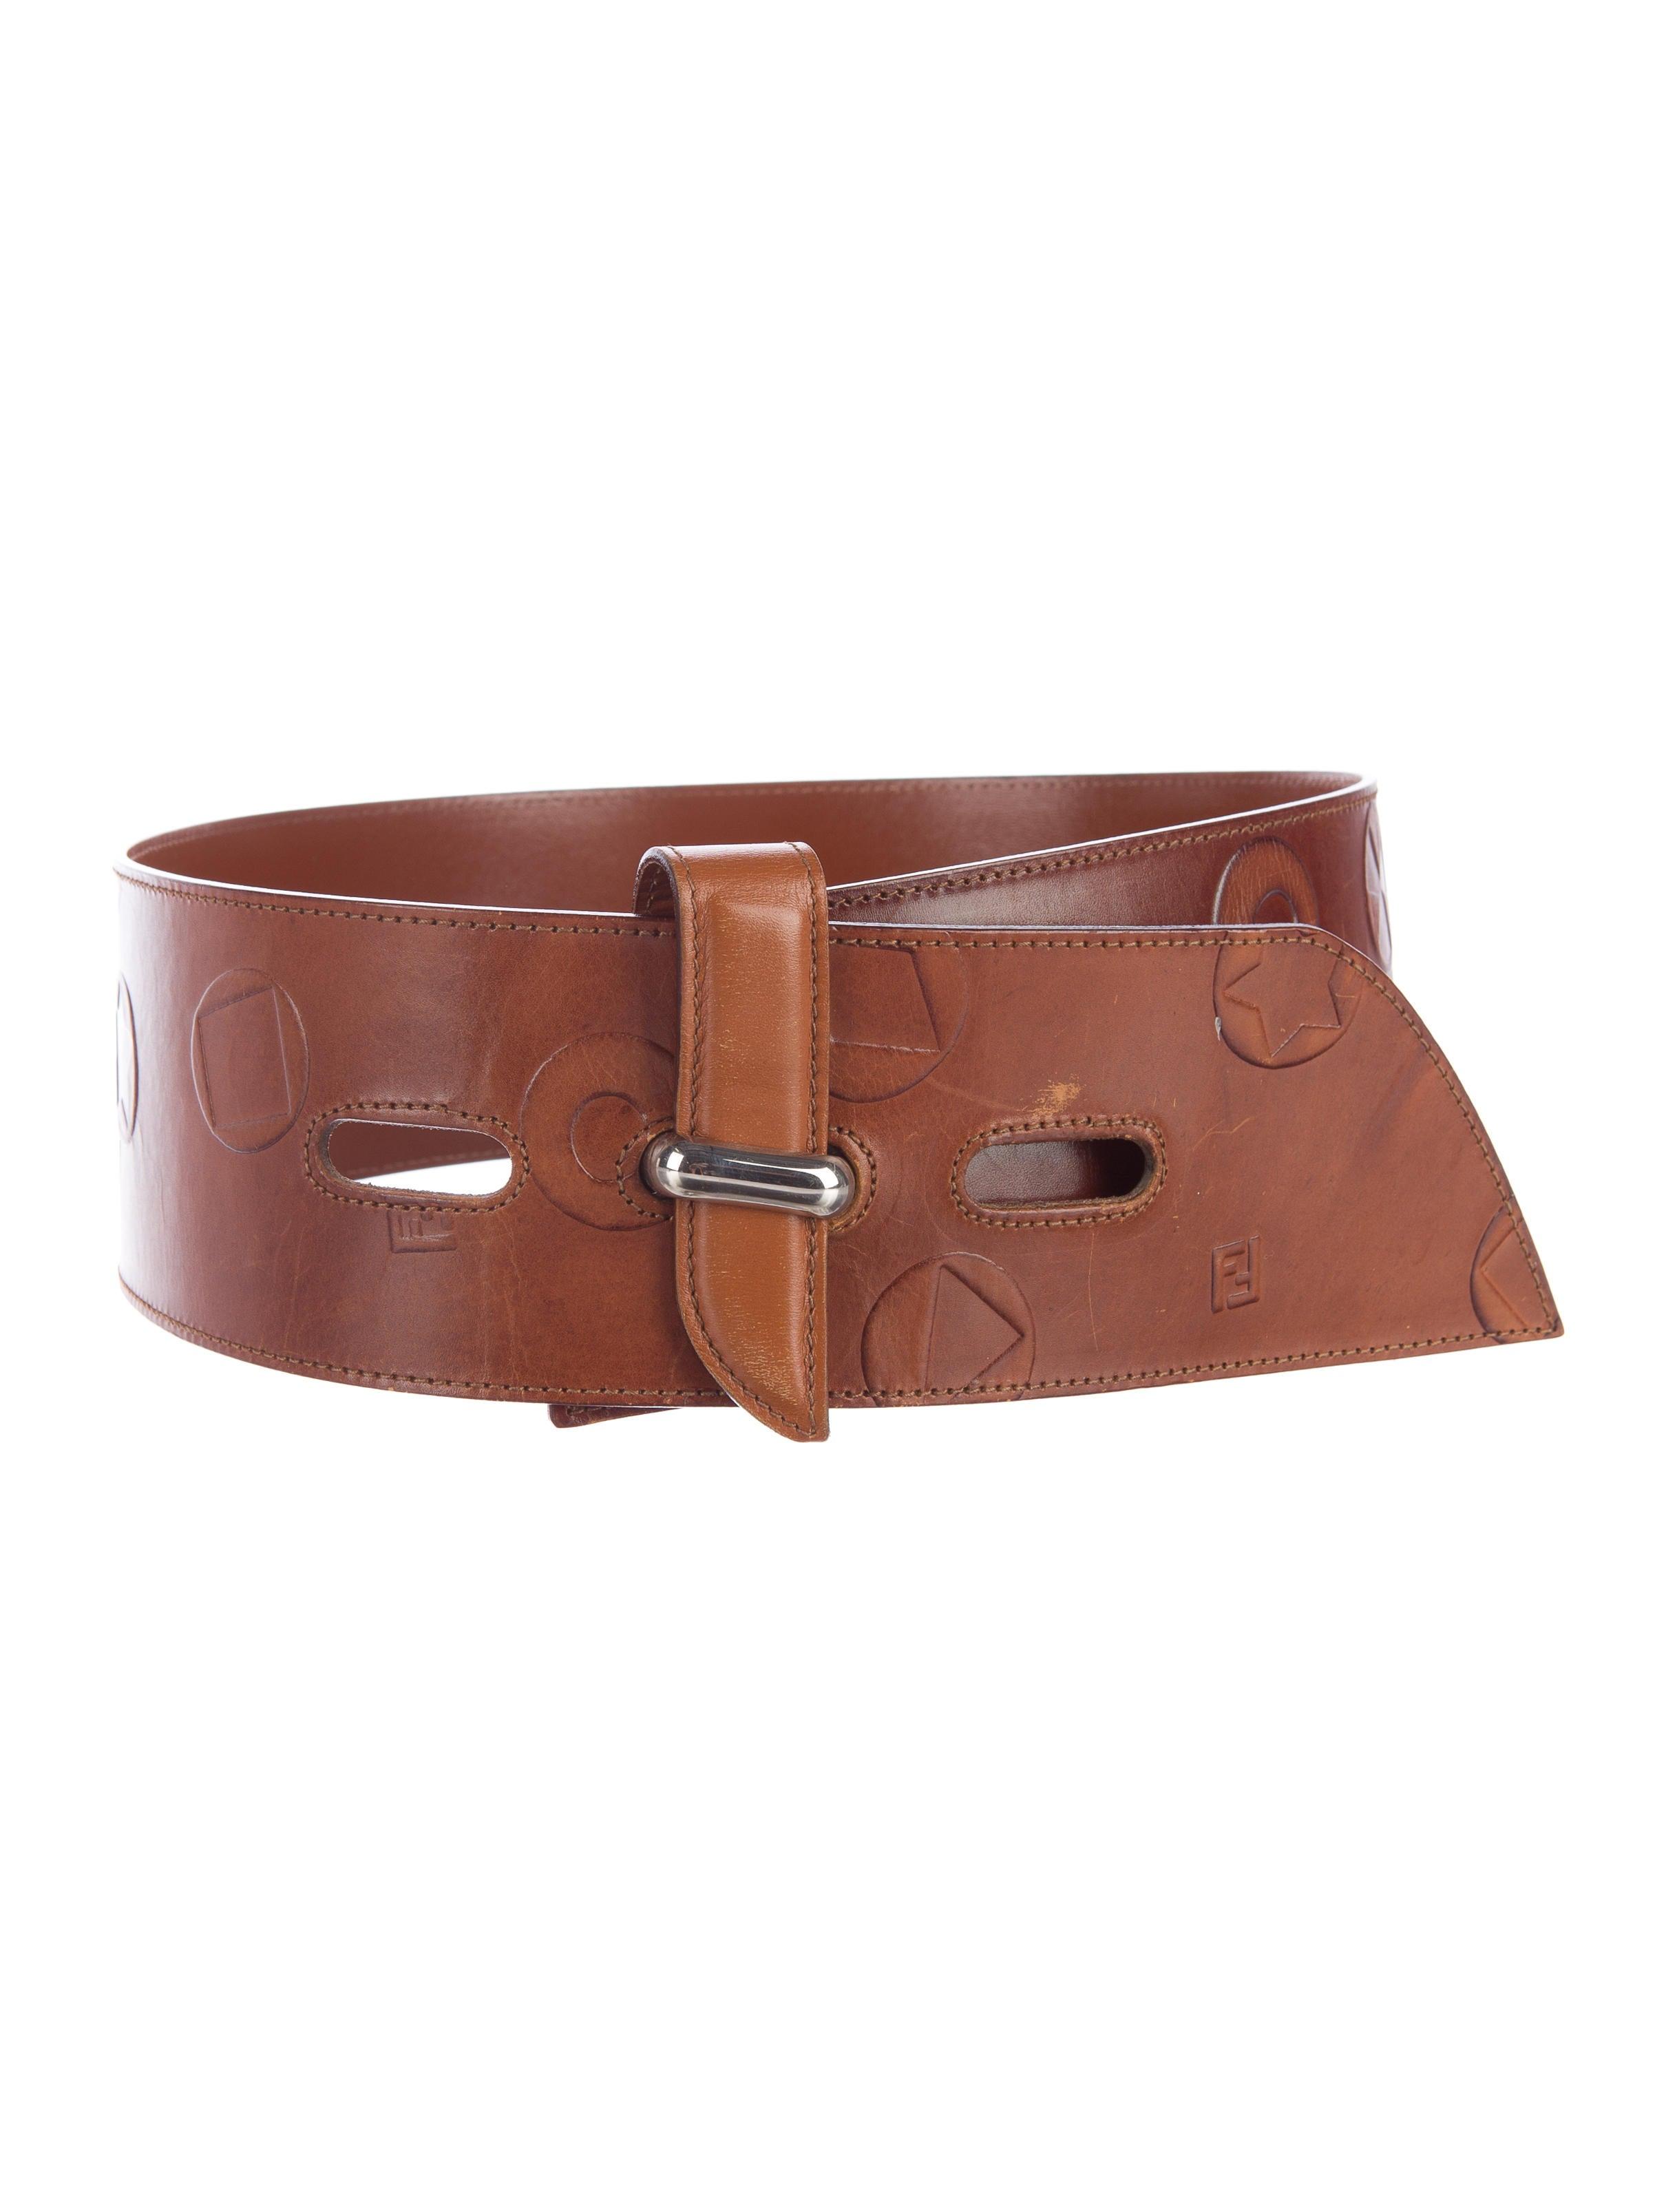 fendi leather embossed belt accessories fen52400 the